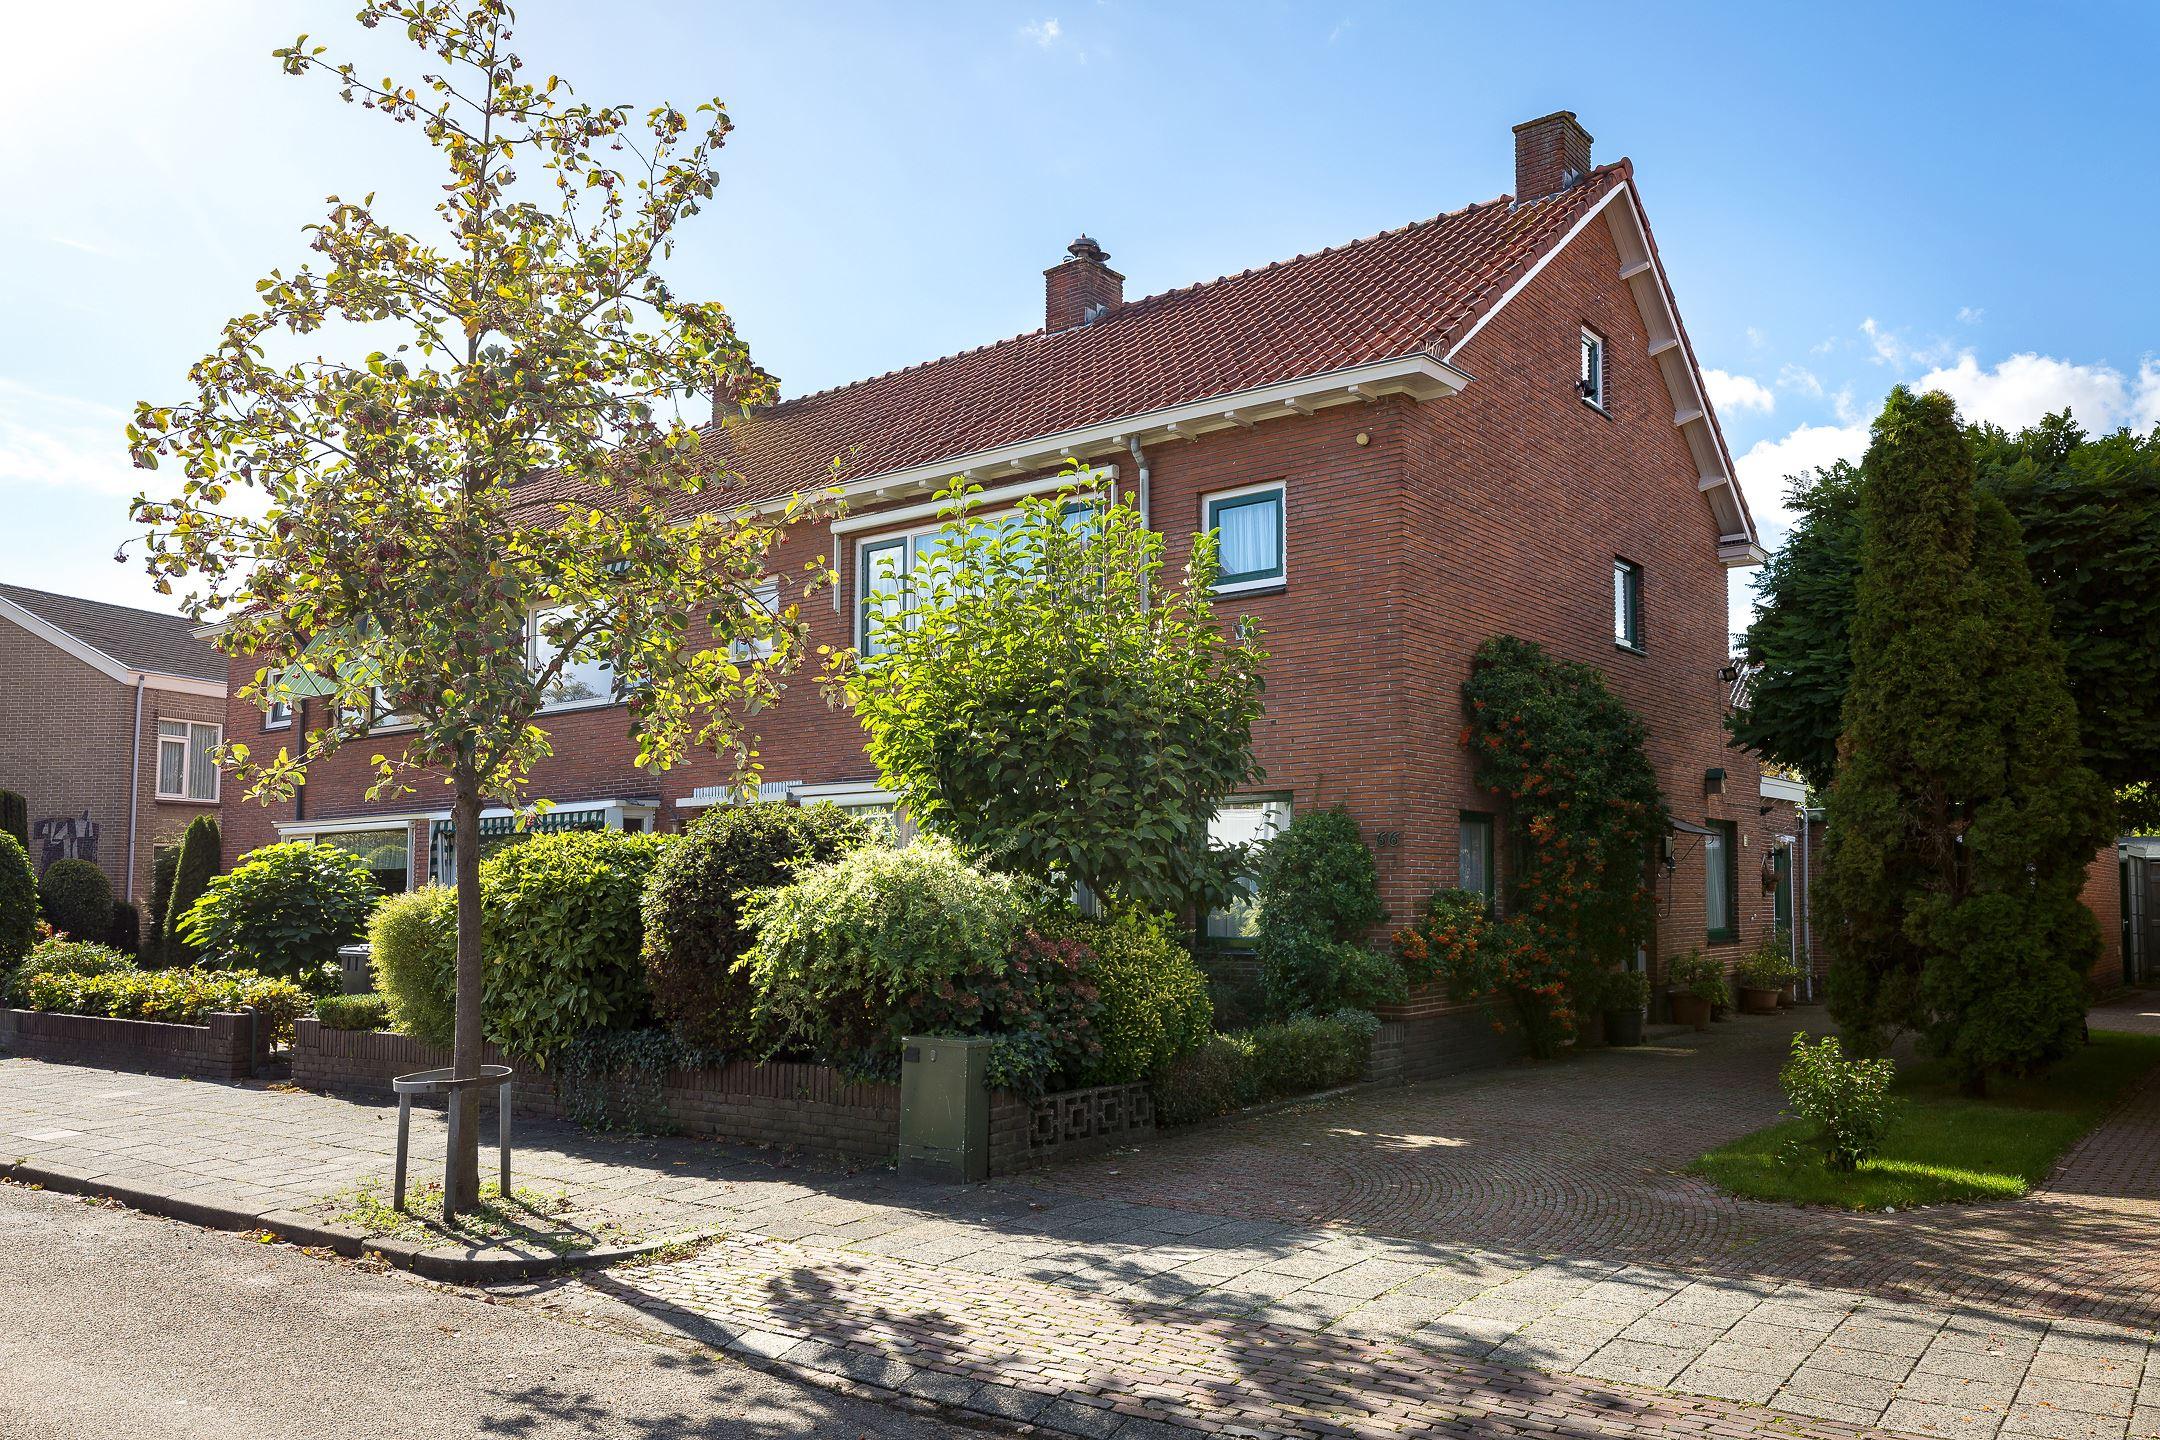 Huis te koop birkenheuvelweg 66 1215 ev hilversum funda for Huis hilversum